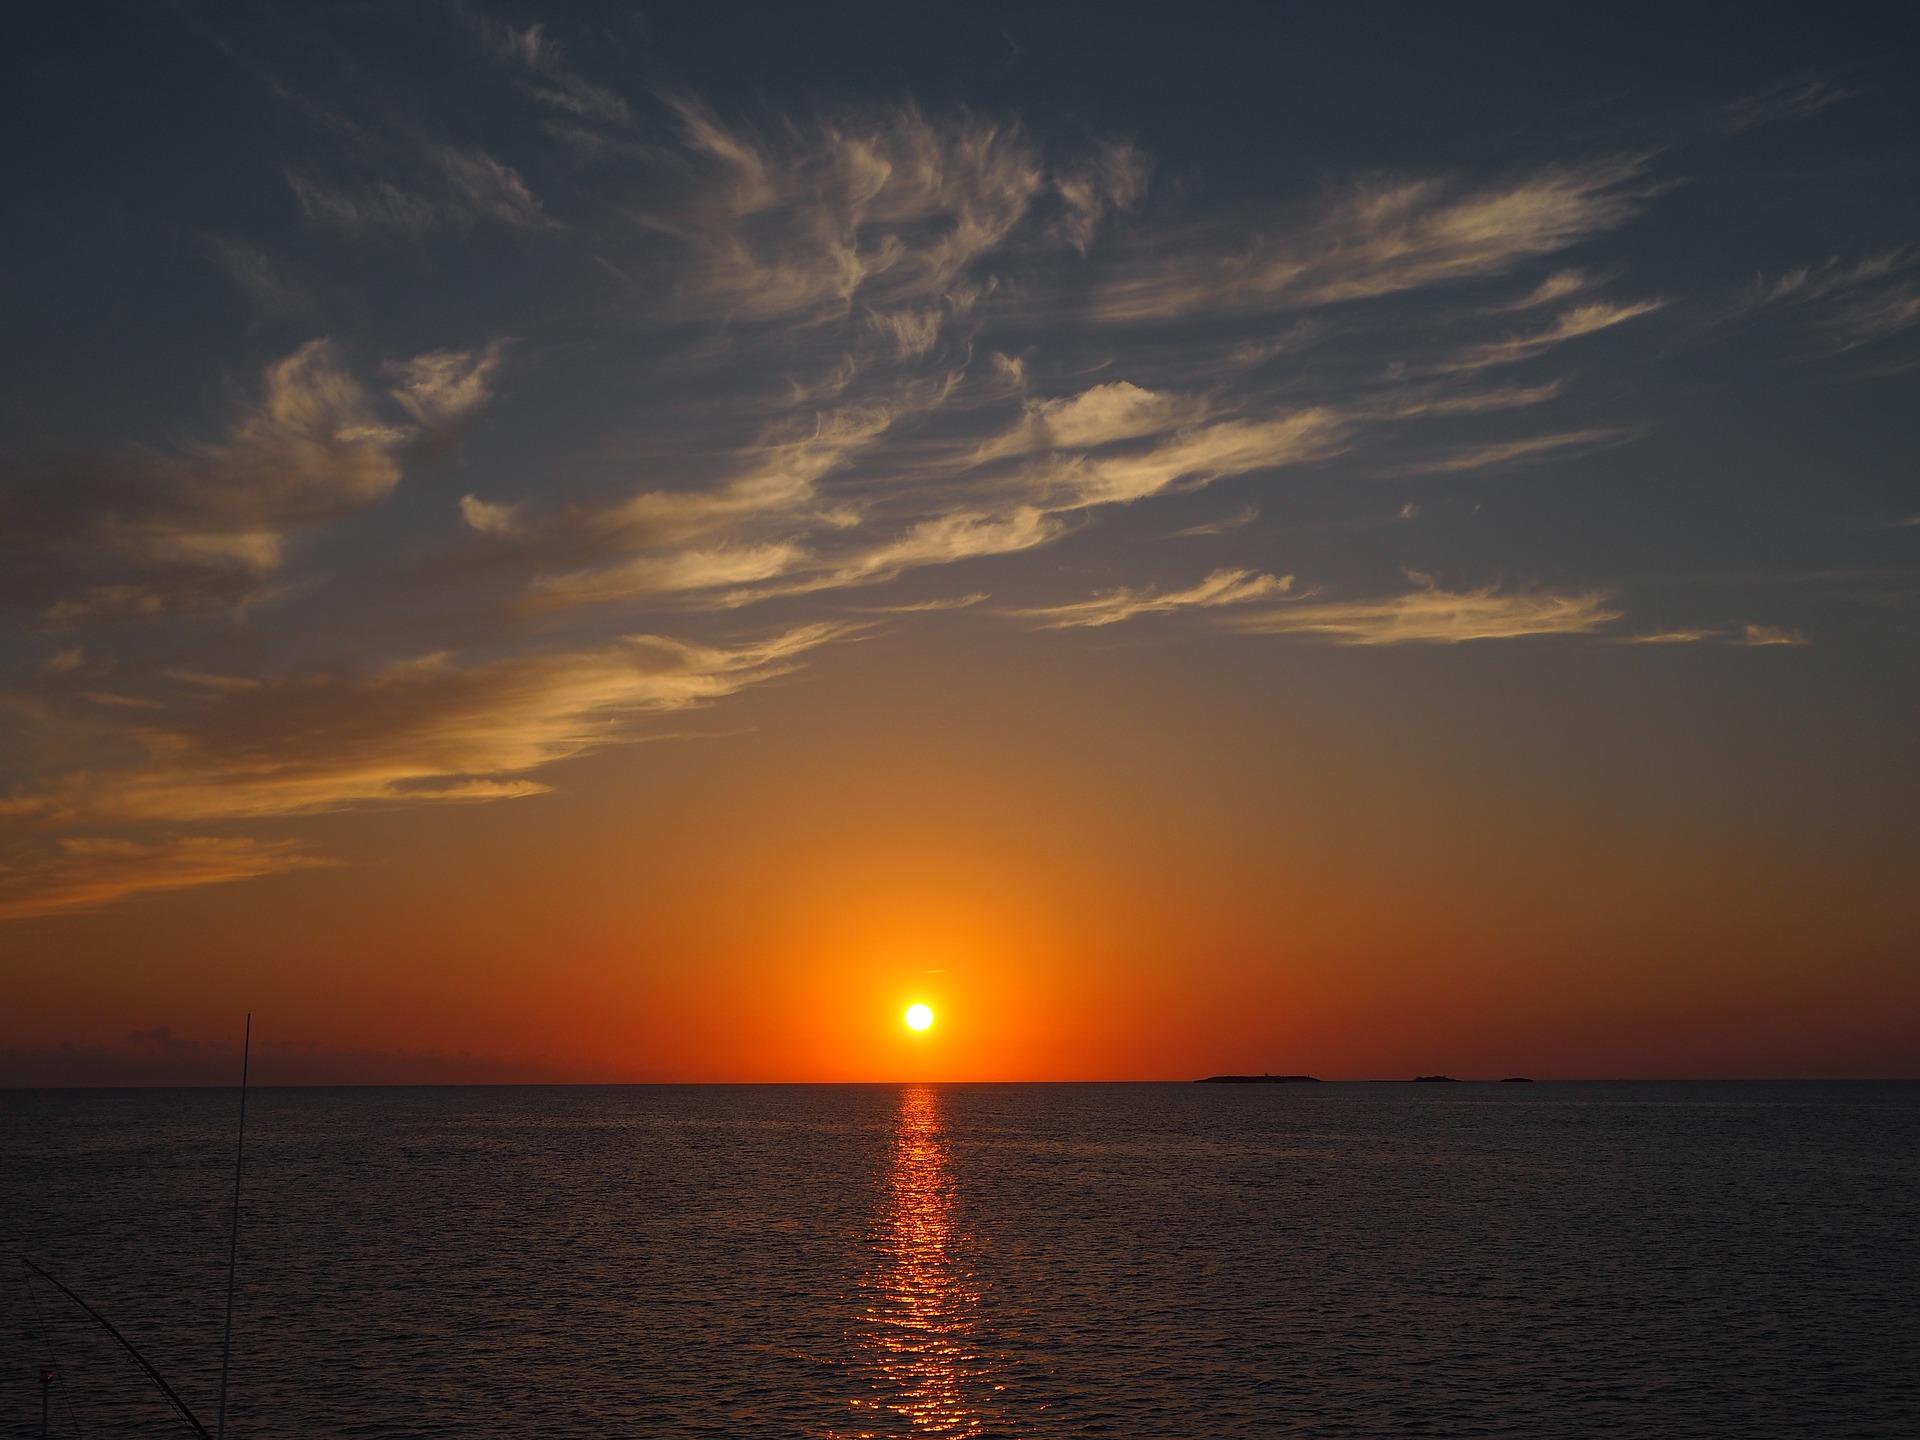 sunset-2428829_1920 (1)